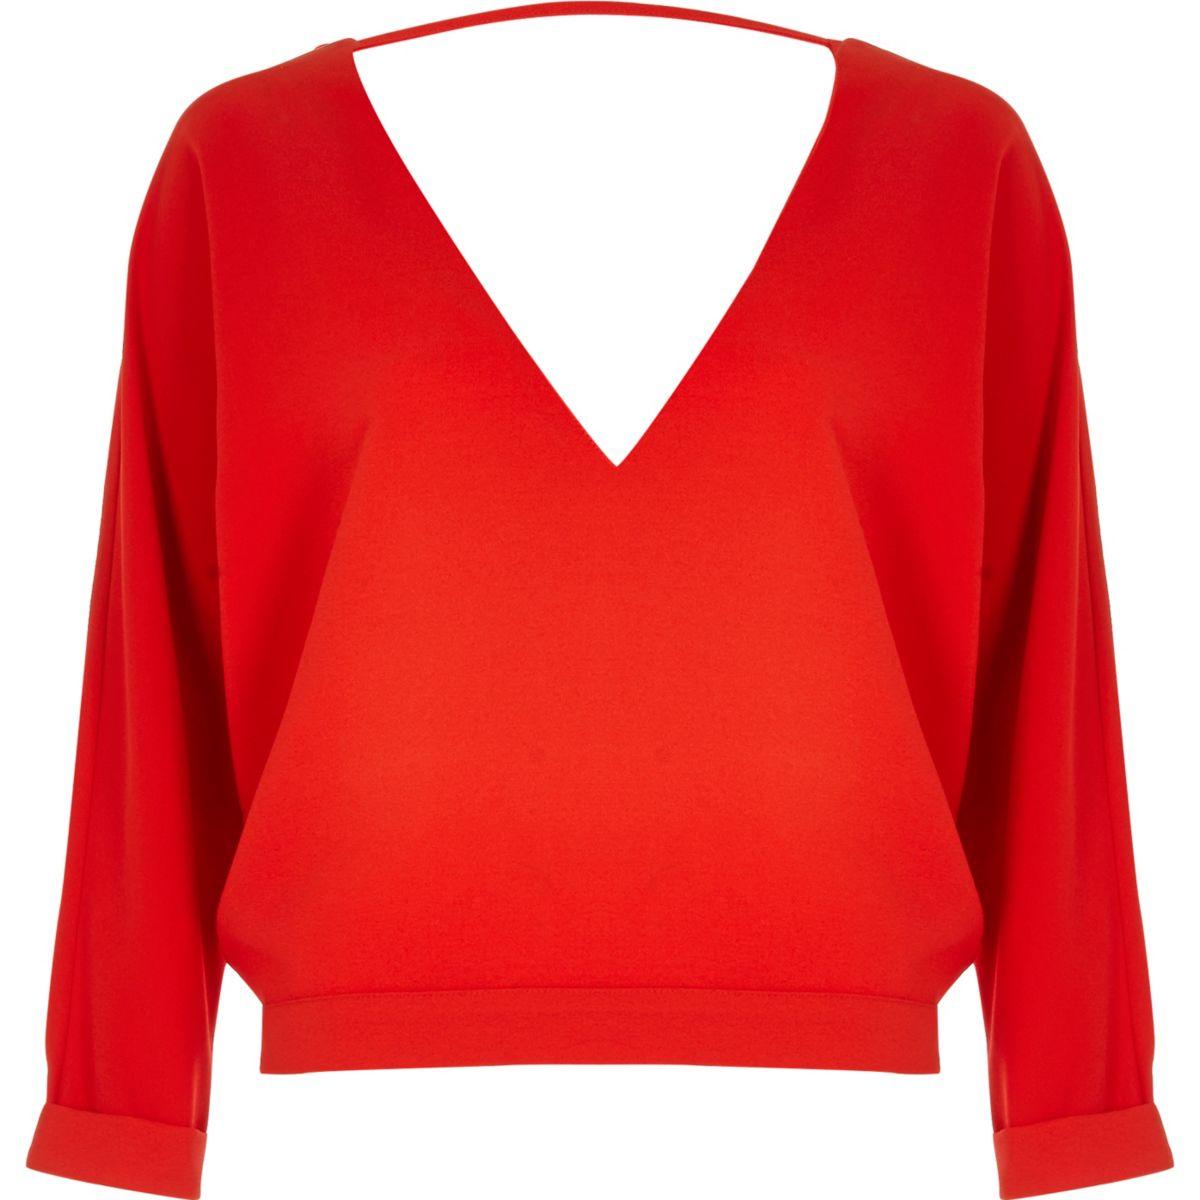 Red plunge strap back top